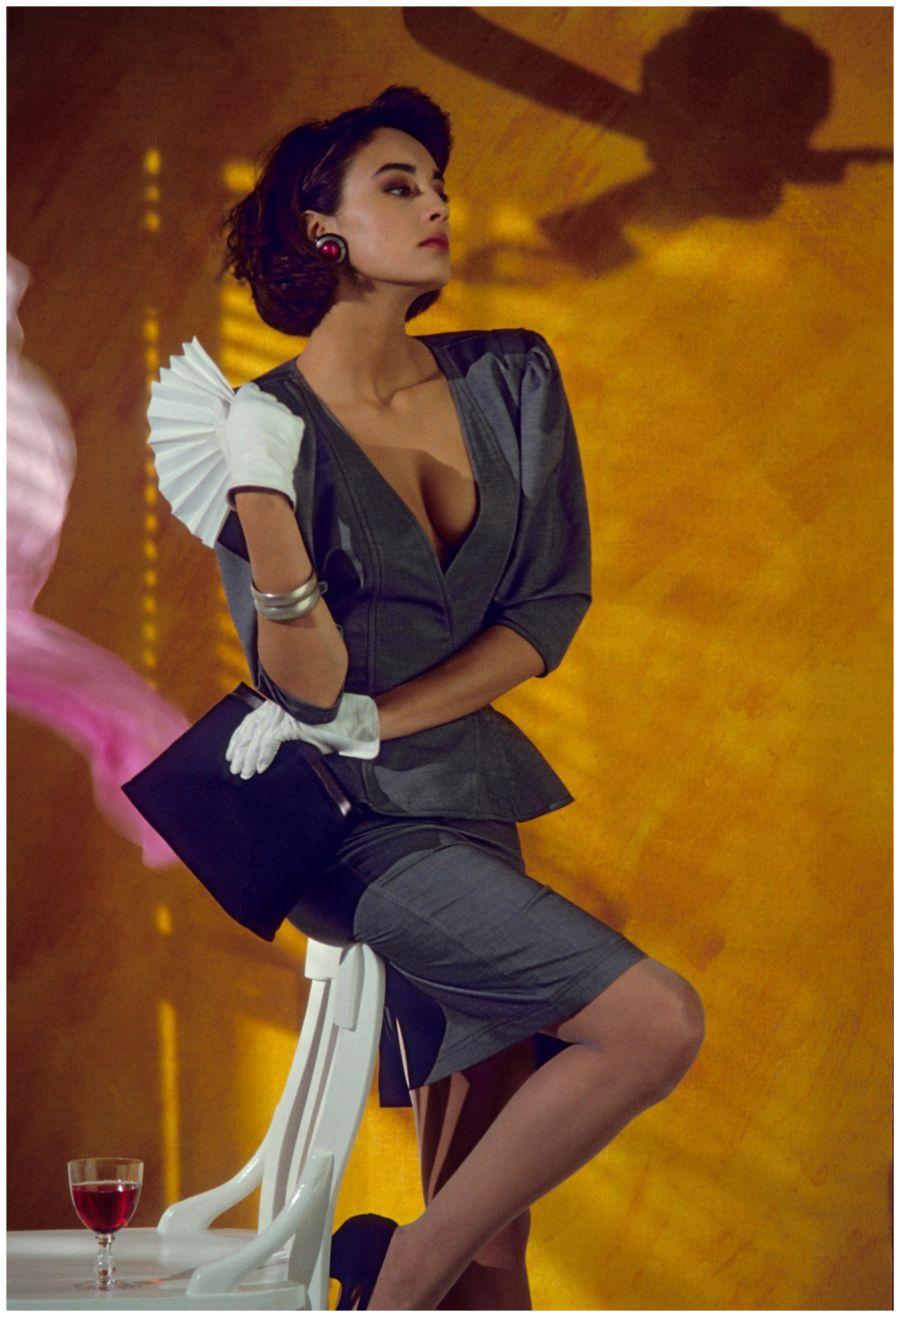 1985, Paris, for Figaro Madame (b)Frank Horvat